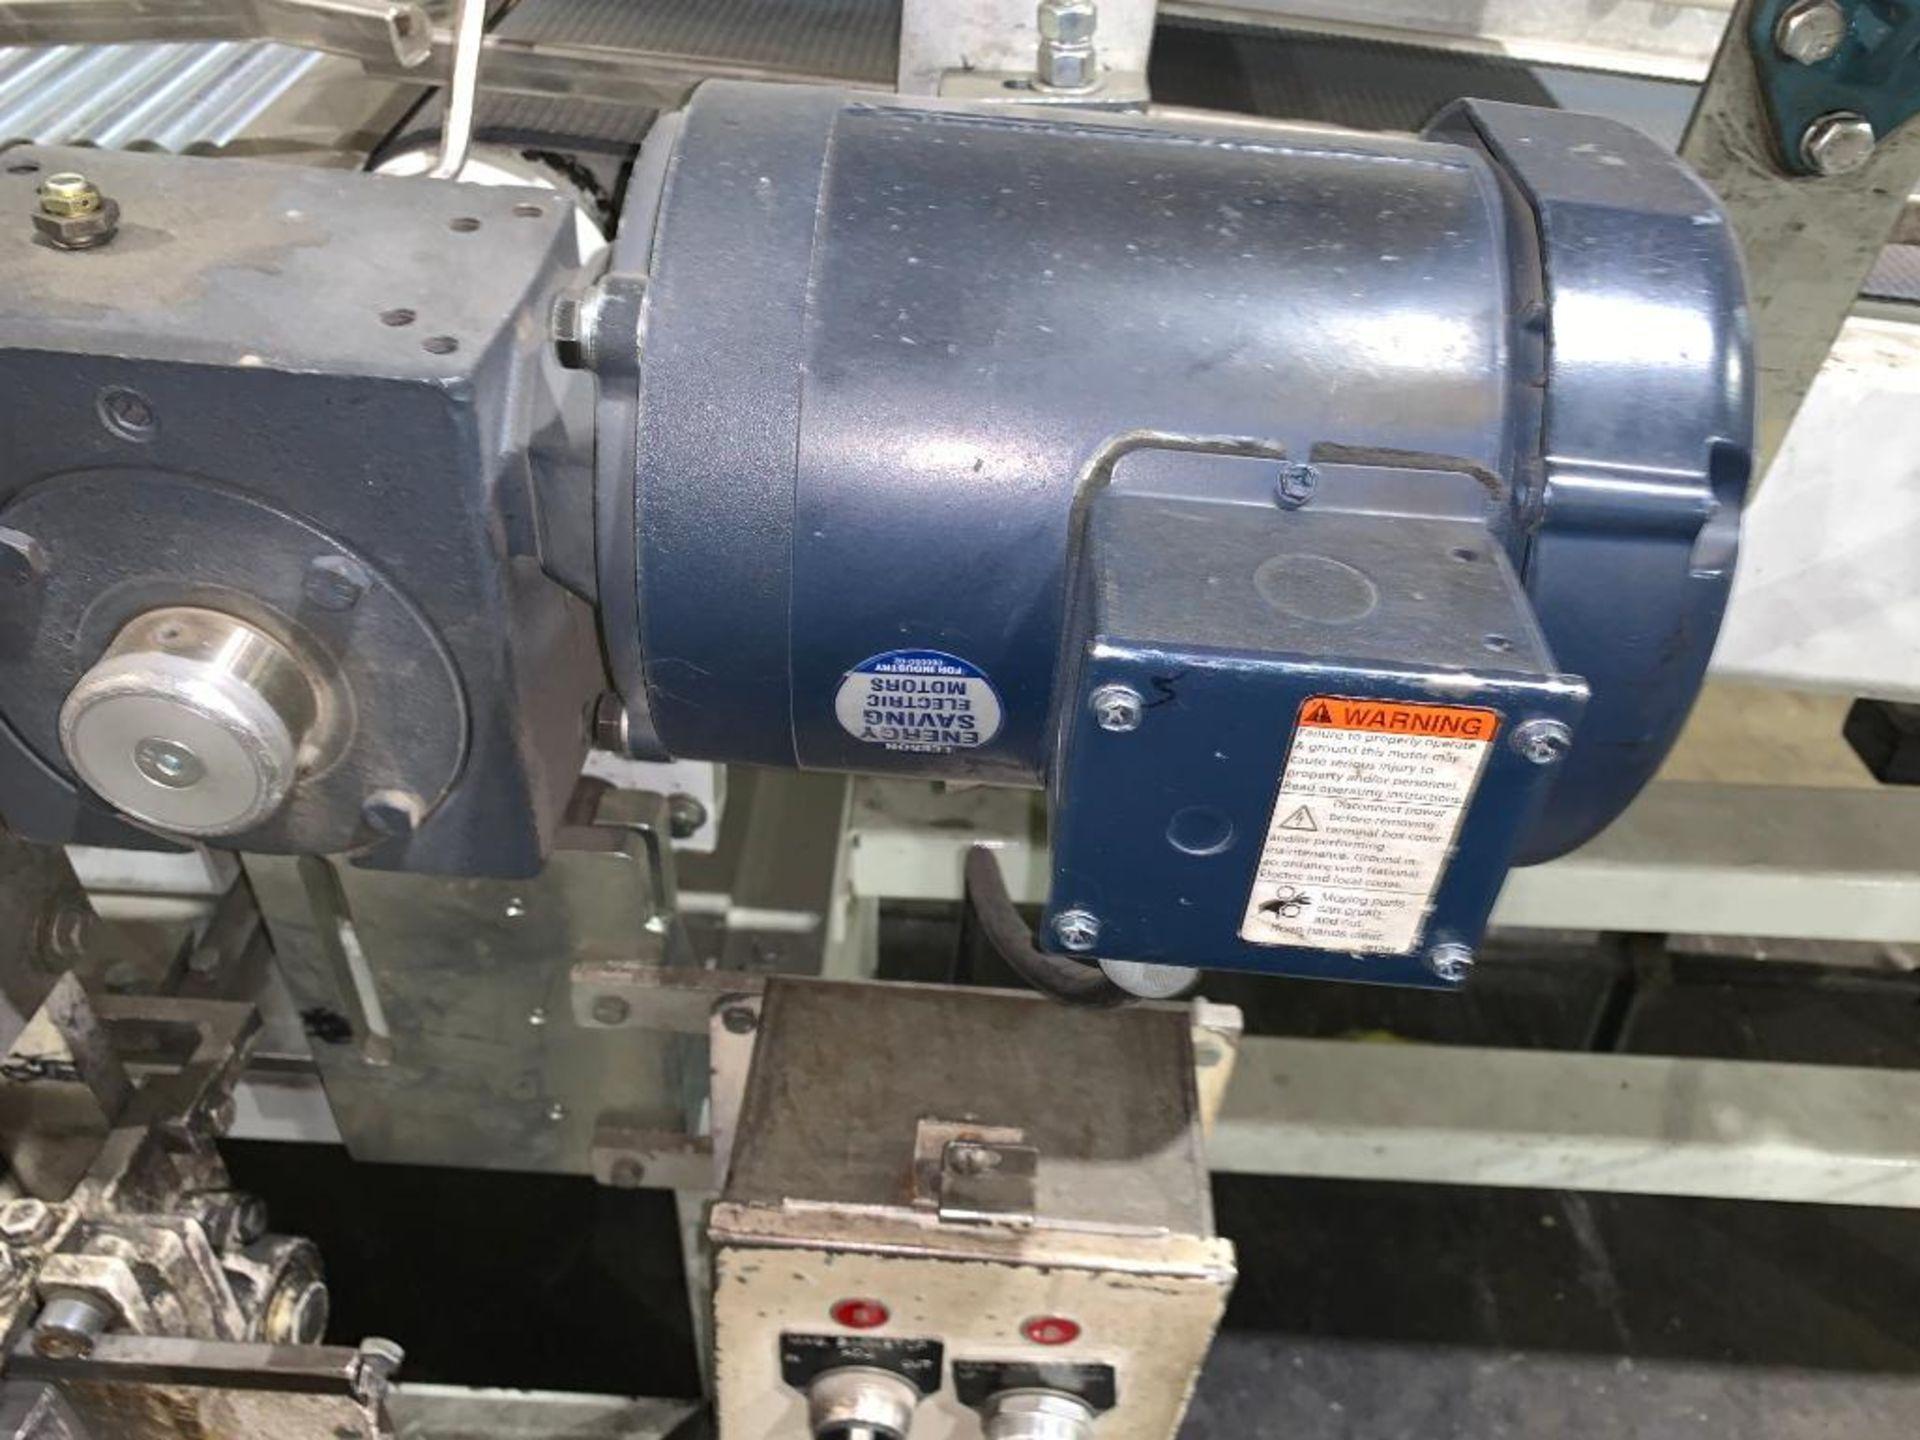 mild steel belt conveyor, 68 in. x 10 in., with box conditioner - Image 2 of 13